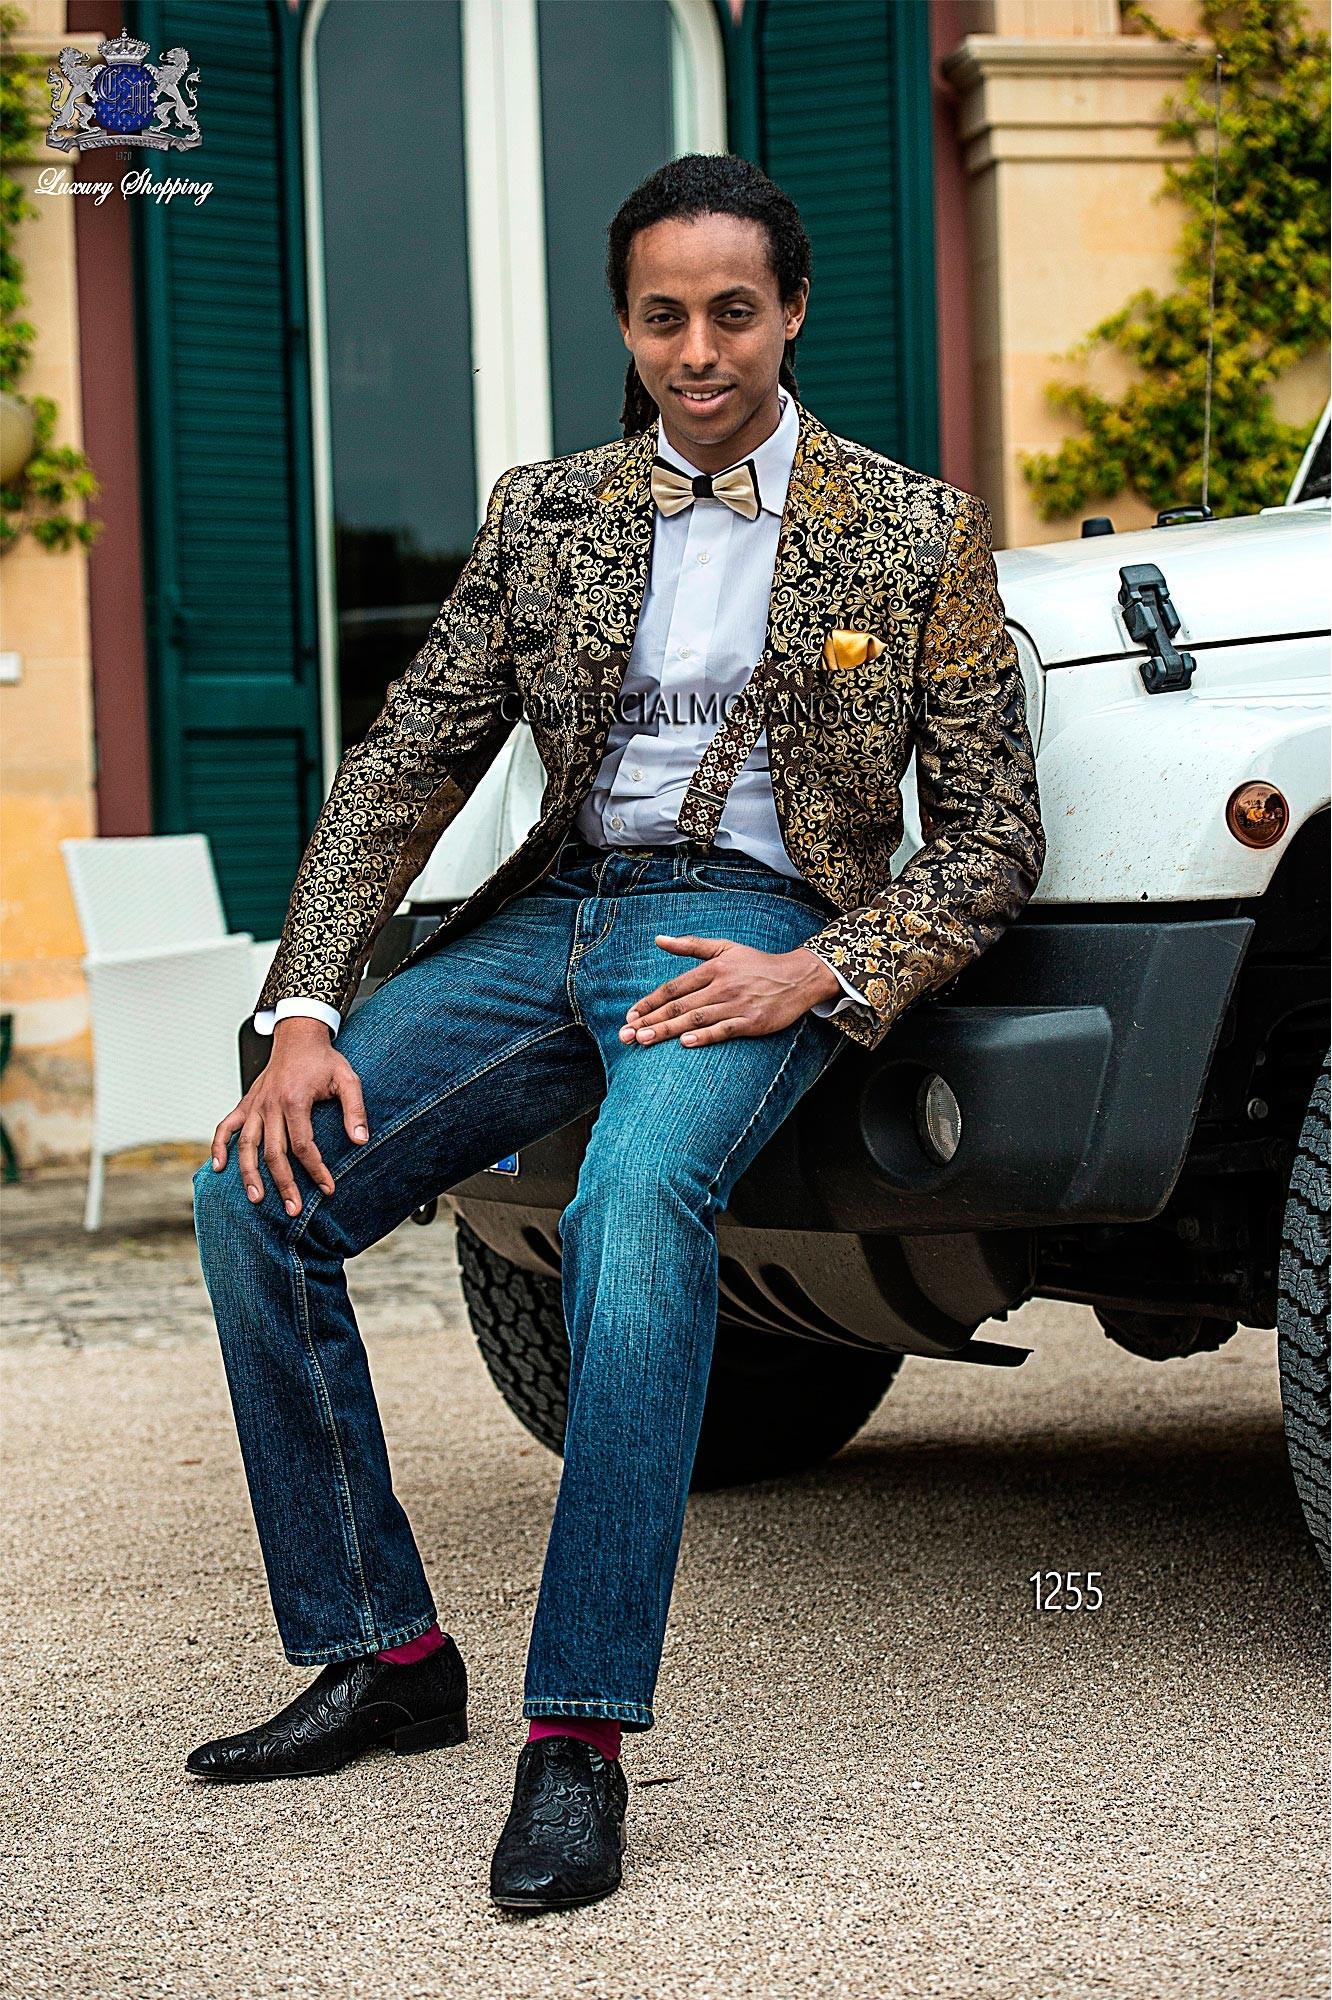 Hipster patchwork men wedding suit model 1255 Ottavio Nuccio Gala